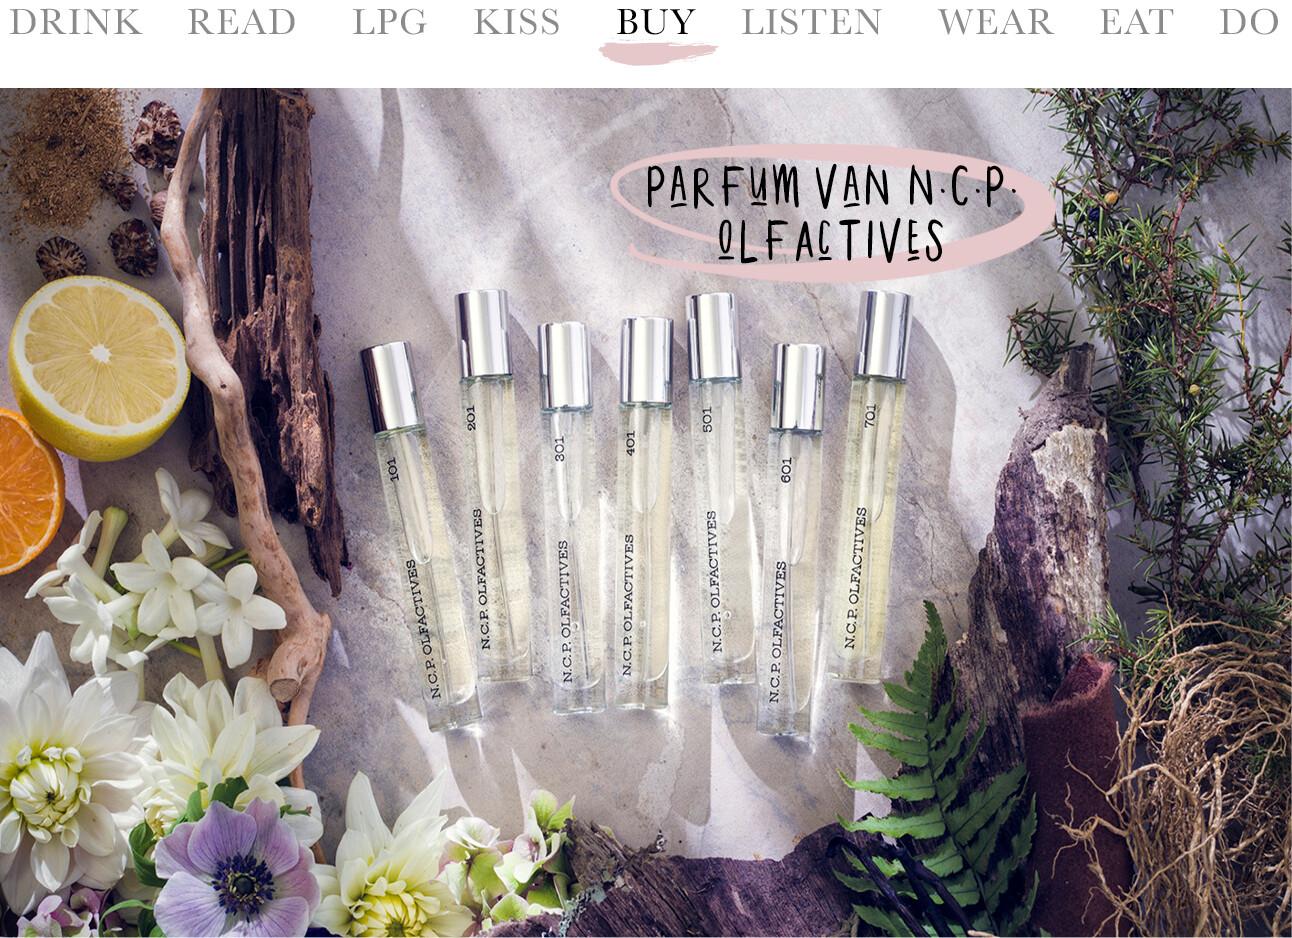 n.c.p olfactives